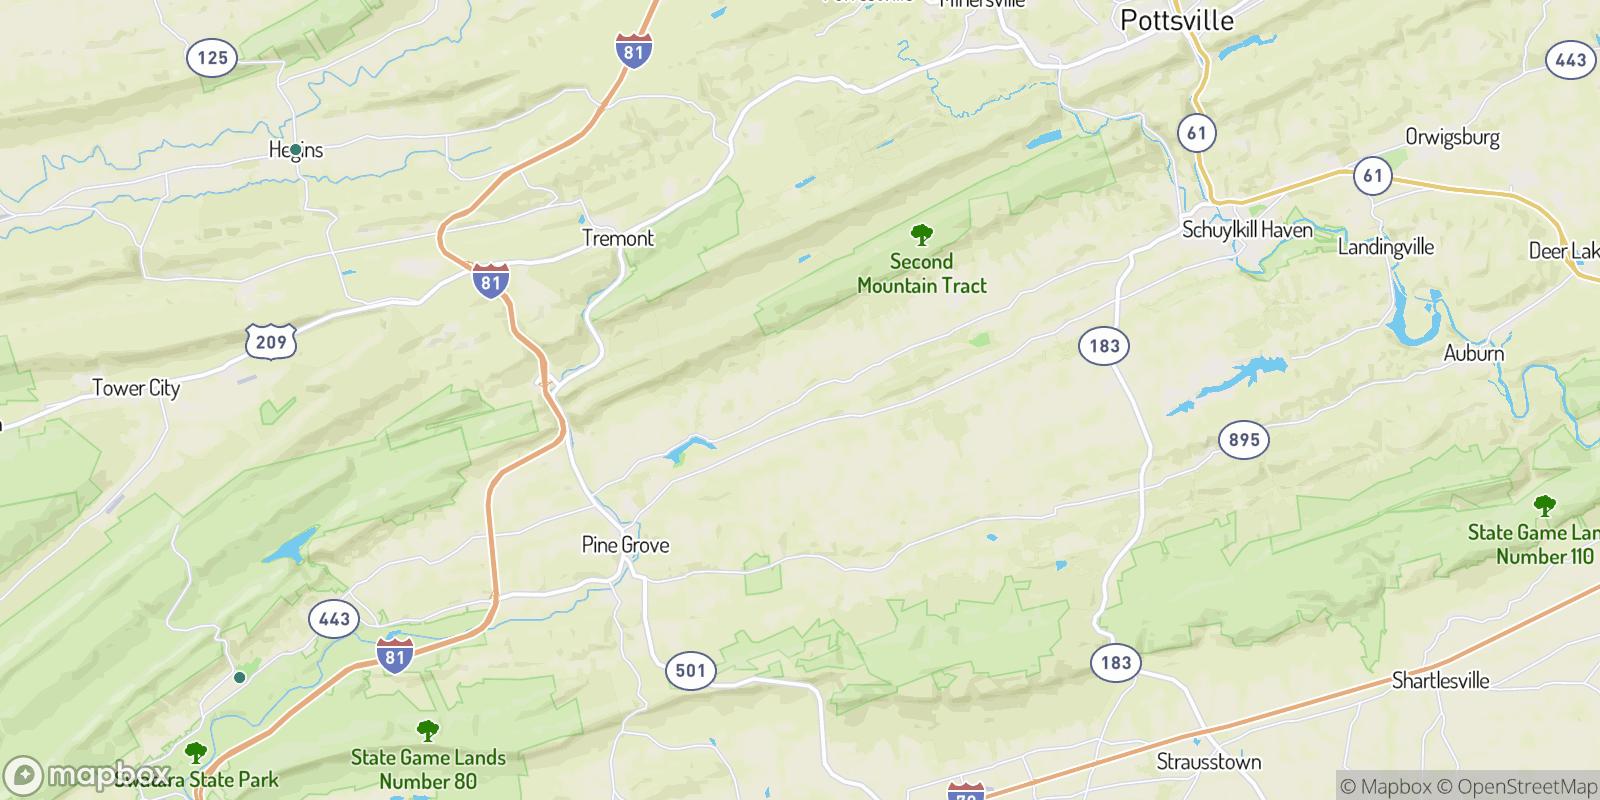 The best camping near Roedersville, Pennsylvania